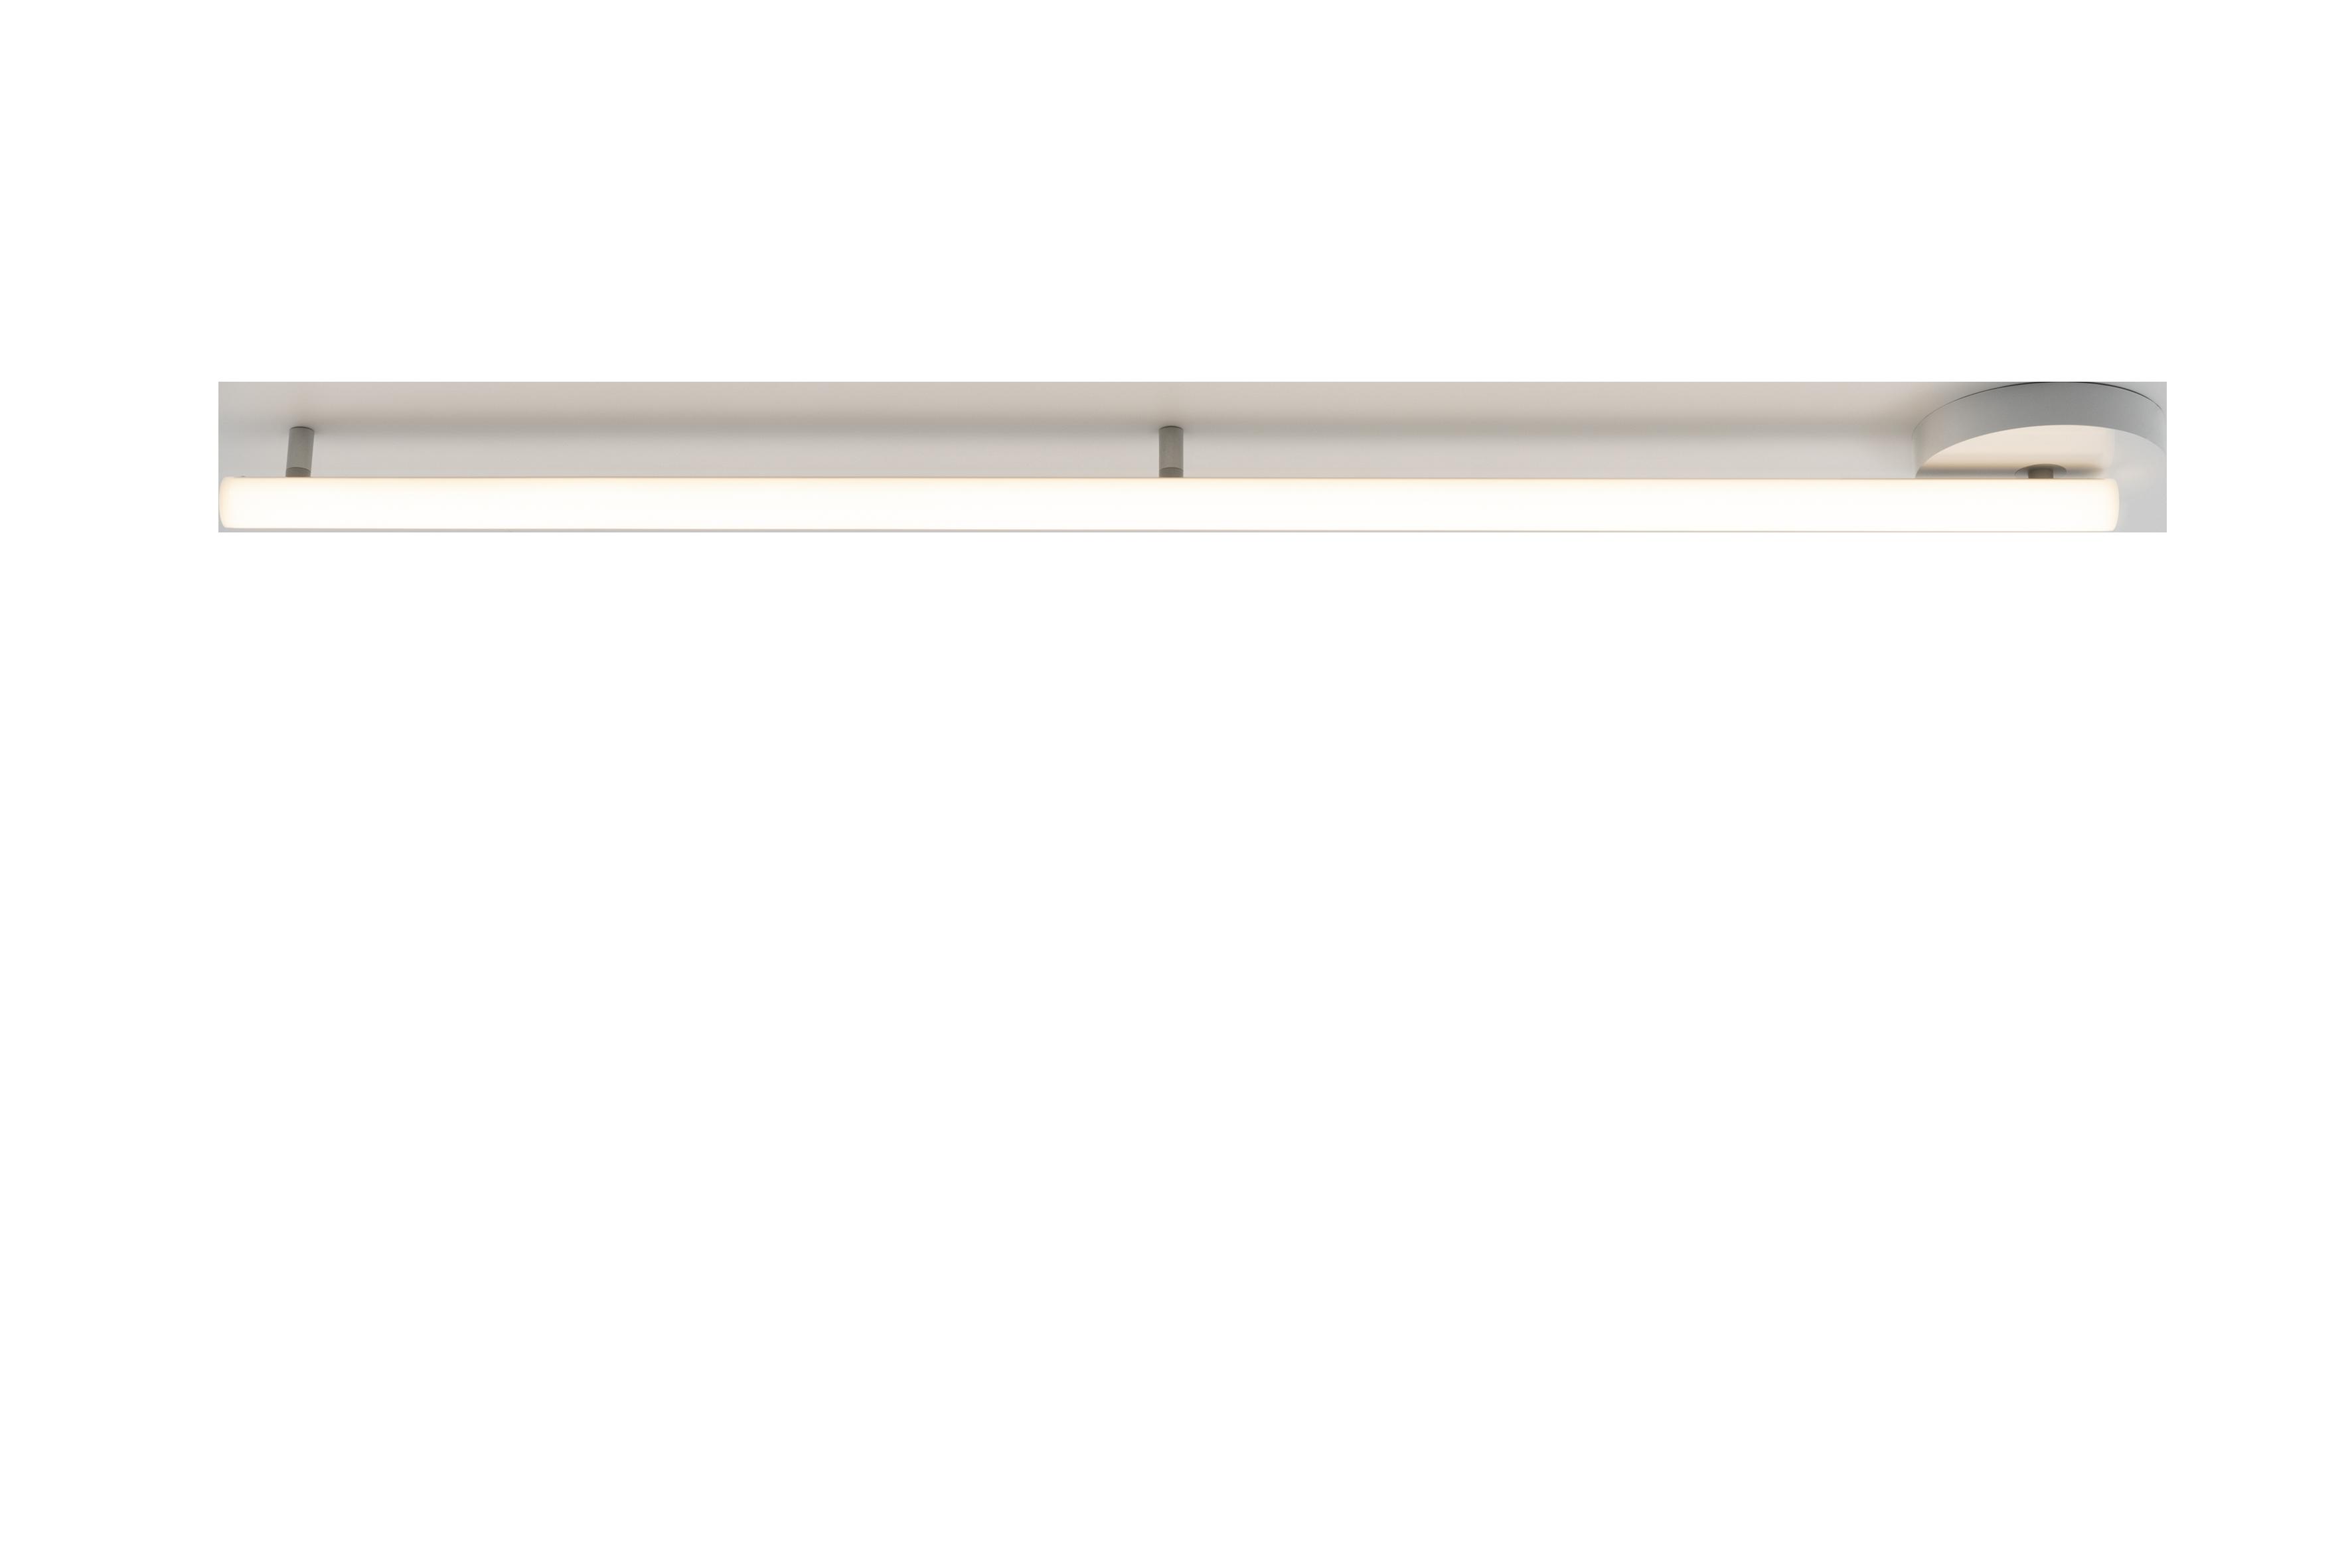 Artemide LED Light system ALPHABET OF LIGHT AoL SYSTEM C/W 45° SLAVE INTERM. 3000K